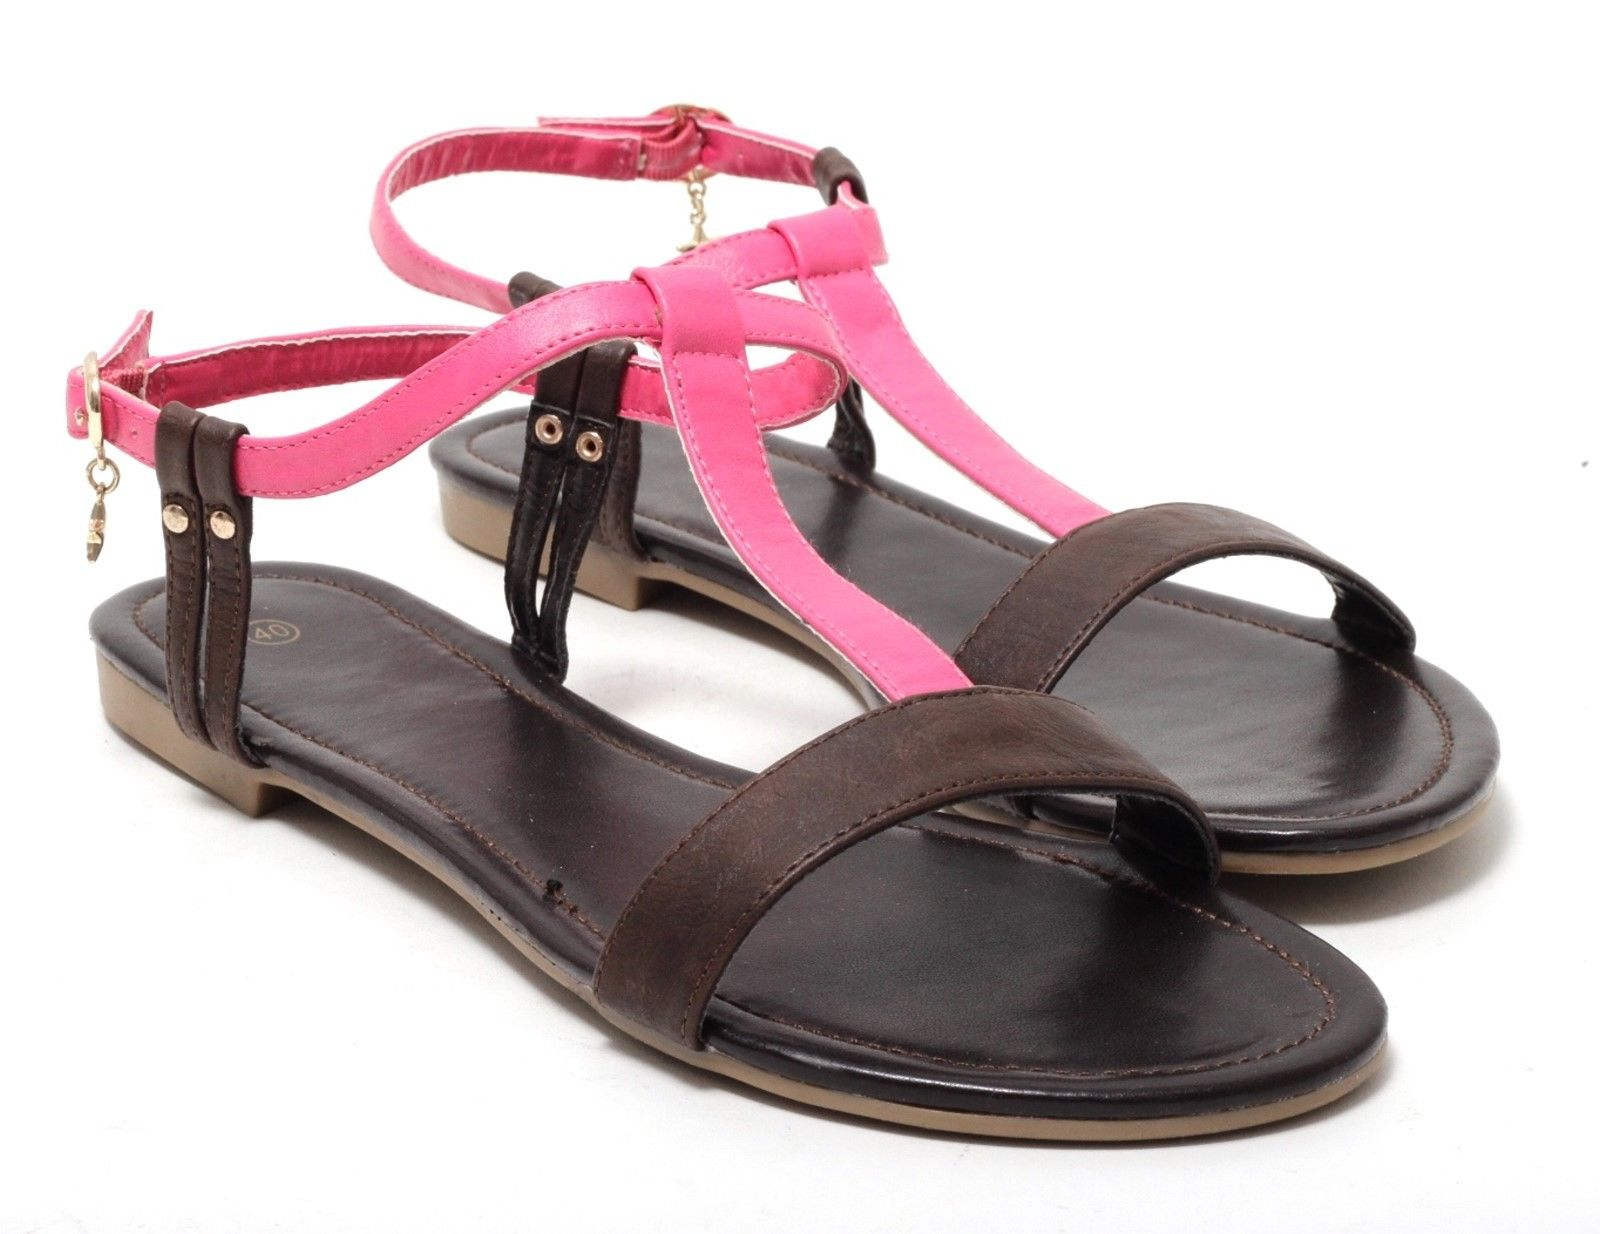 riemchensandalen r mer sandalen sandaletten schuhe charme anh nger braun pink kleidung damenschuhe. Black Bedroom Furniture Sets. Home Design Ideas